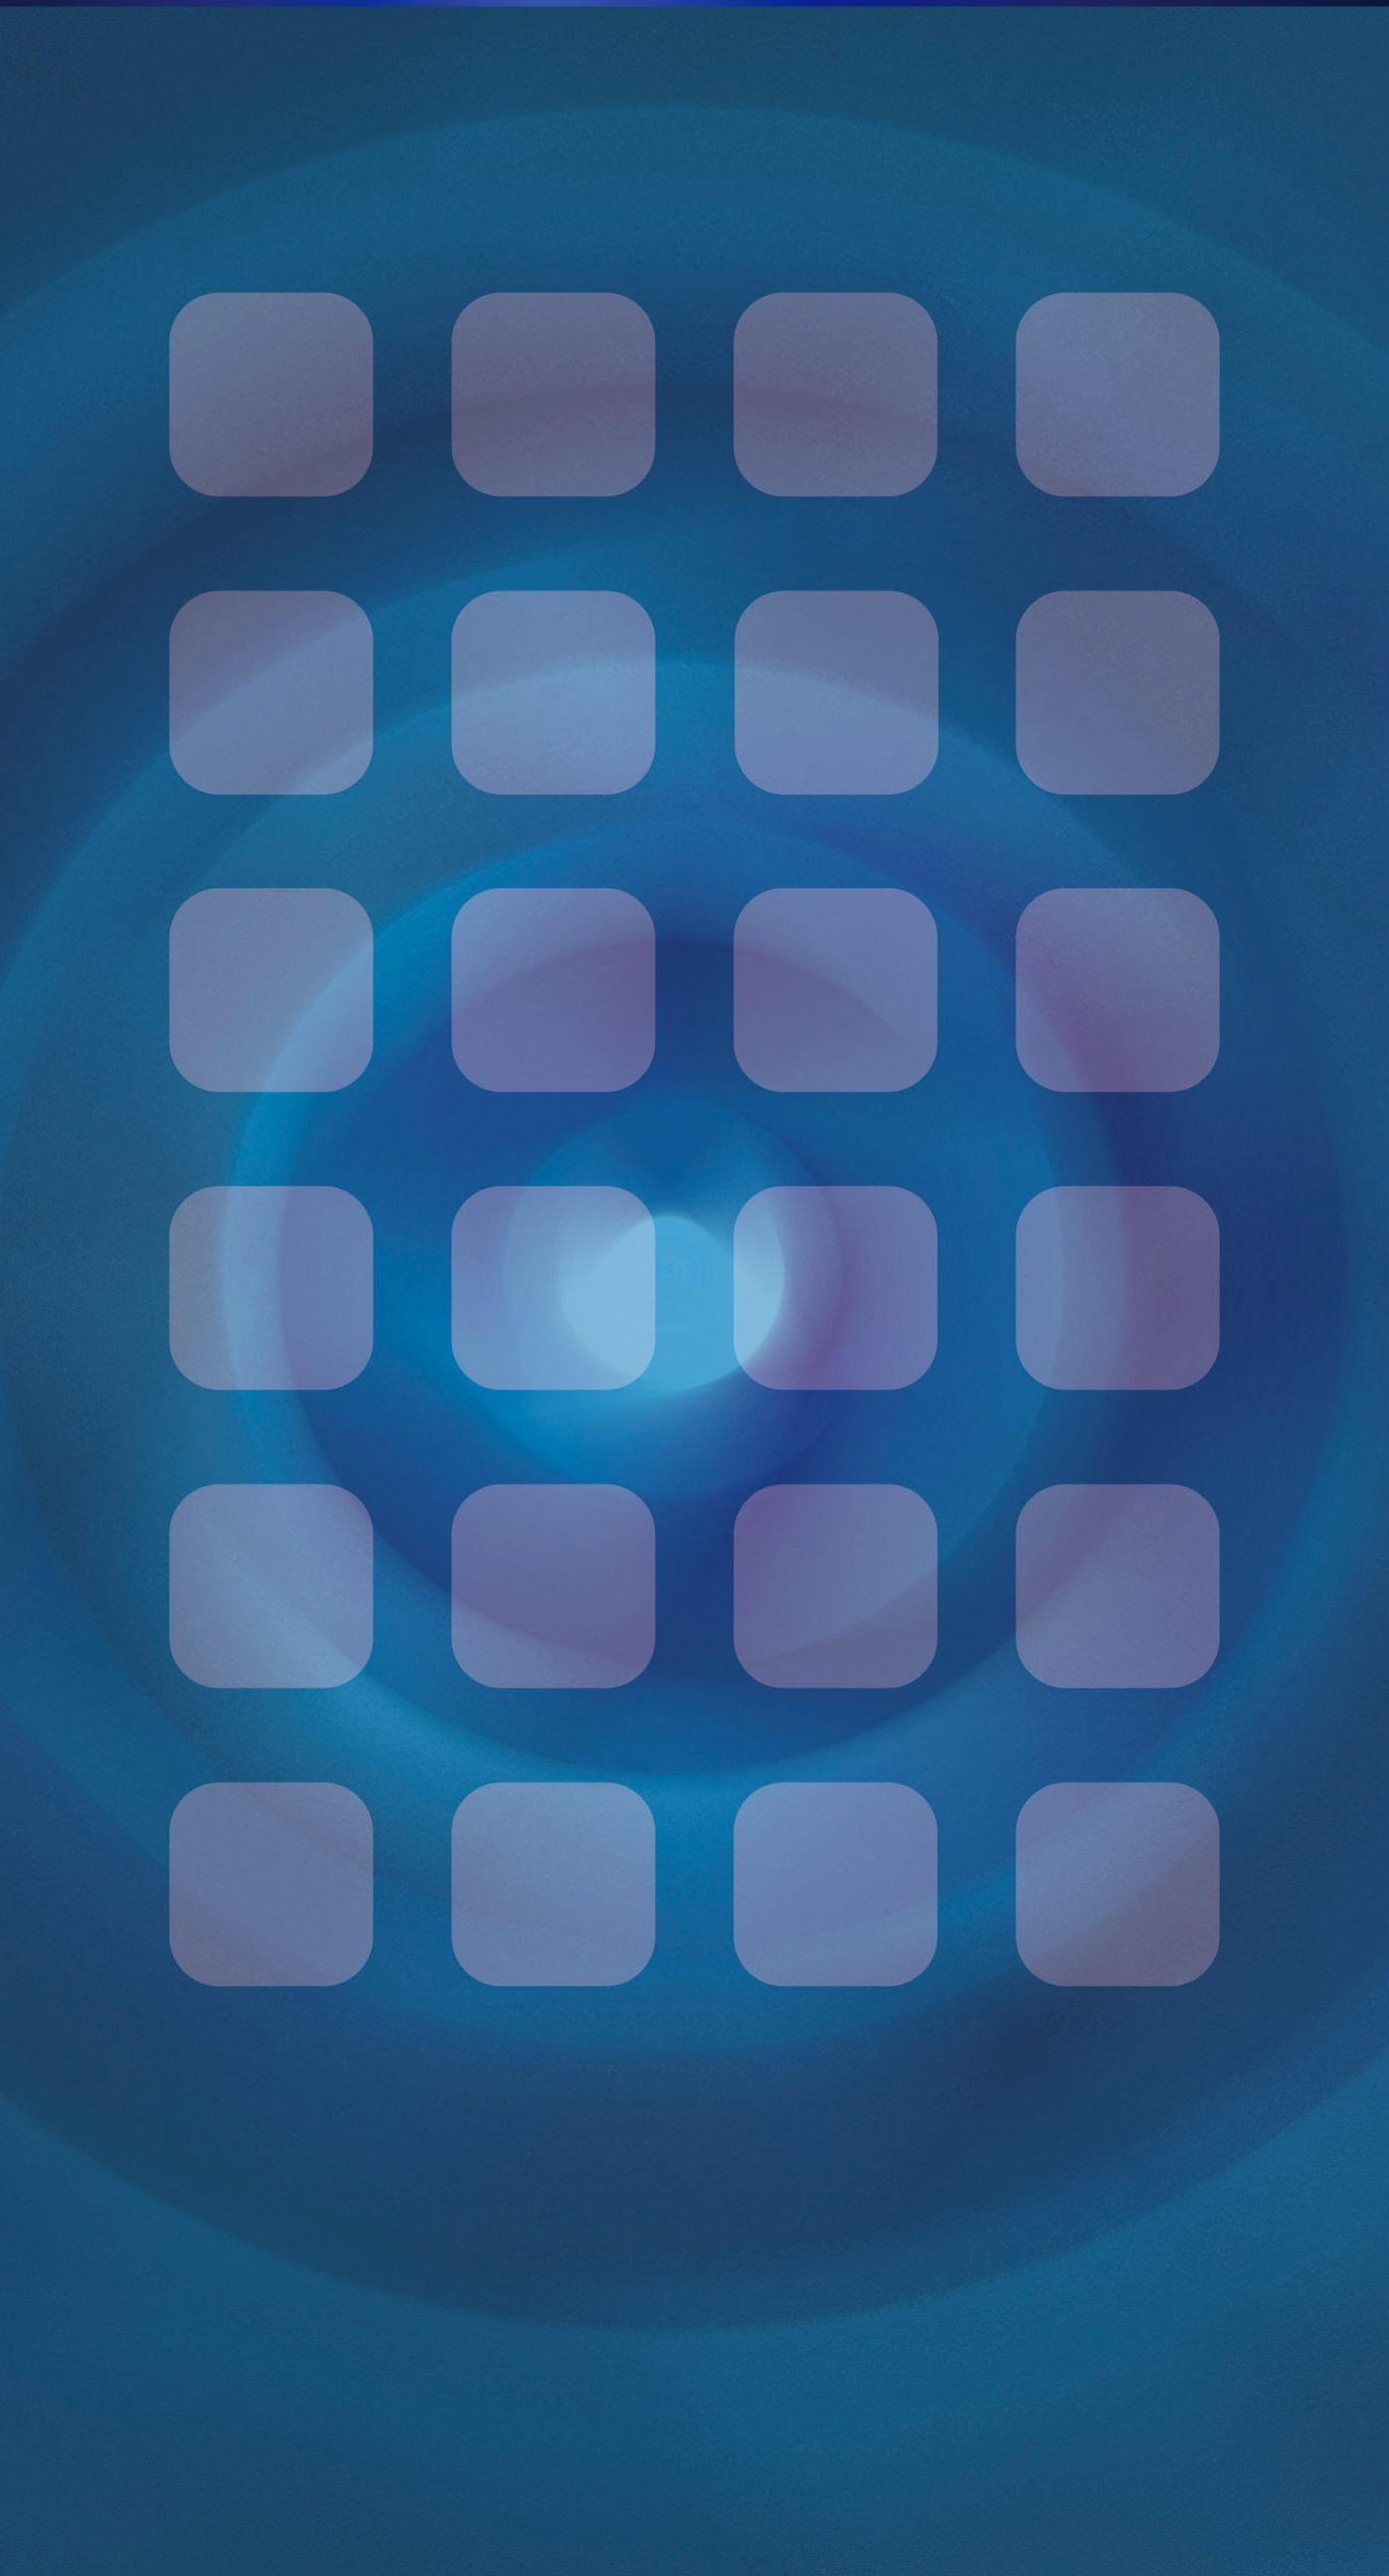 Shelf cool blue swirl pattern wallpapersc iPhone7Plus 1398x2592